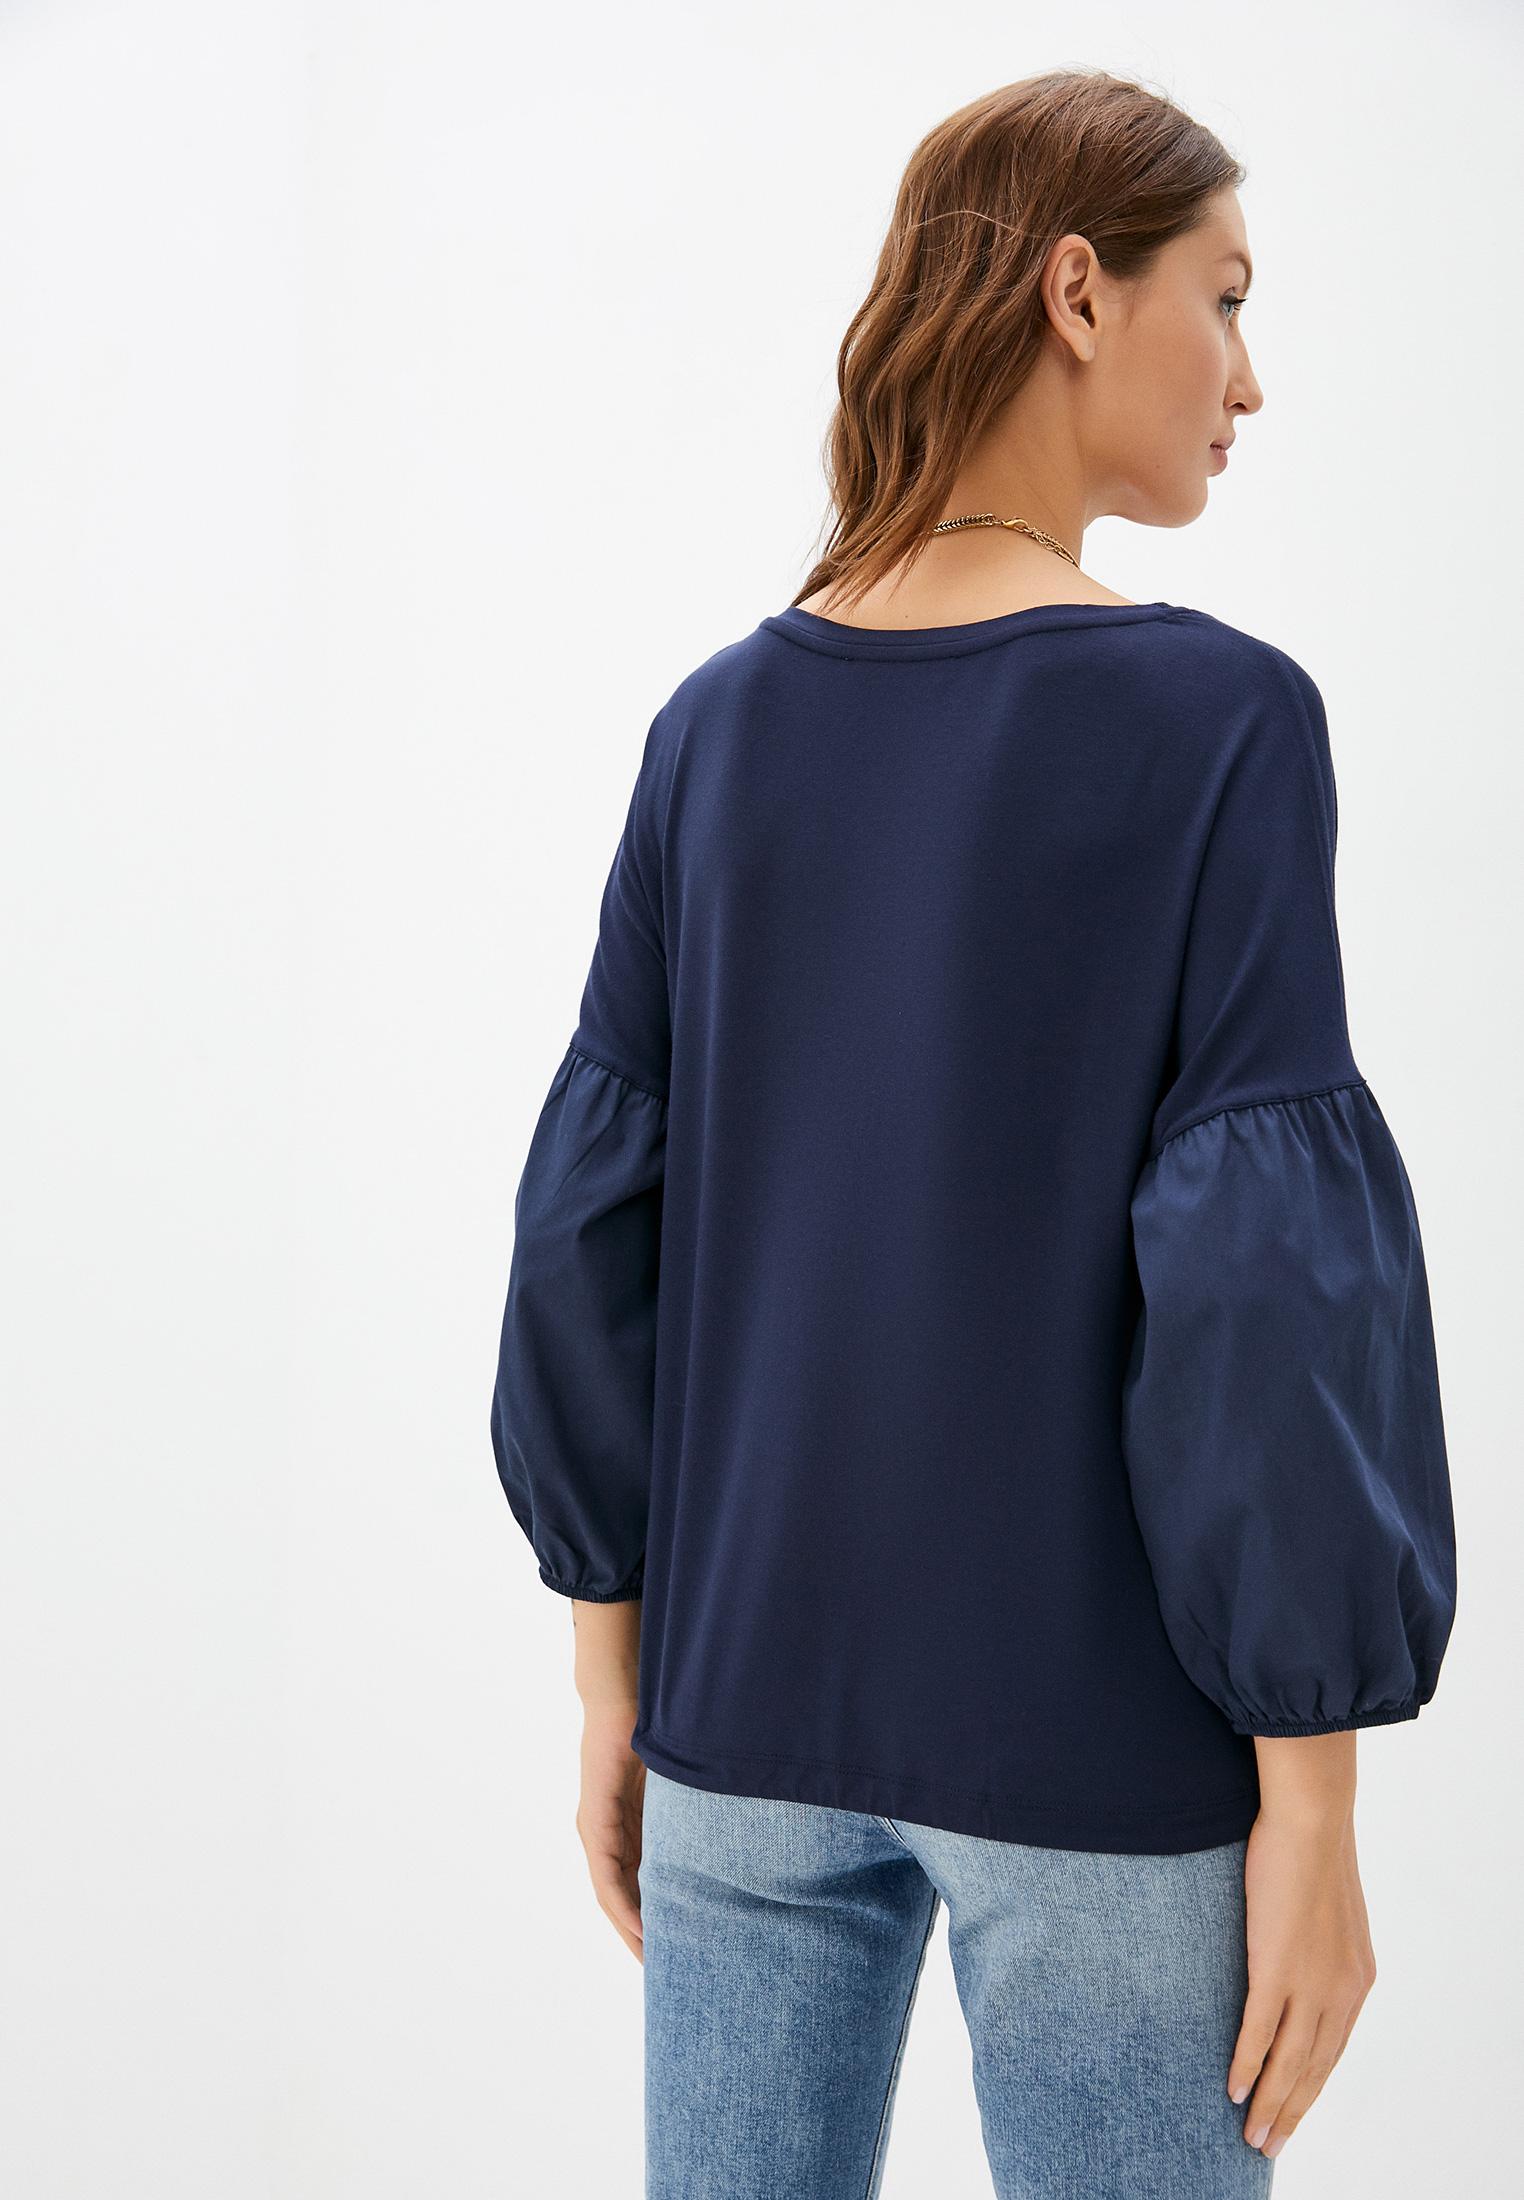 Блуза Betty & Co 2473/3239: изображение 3